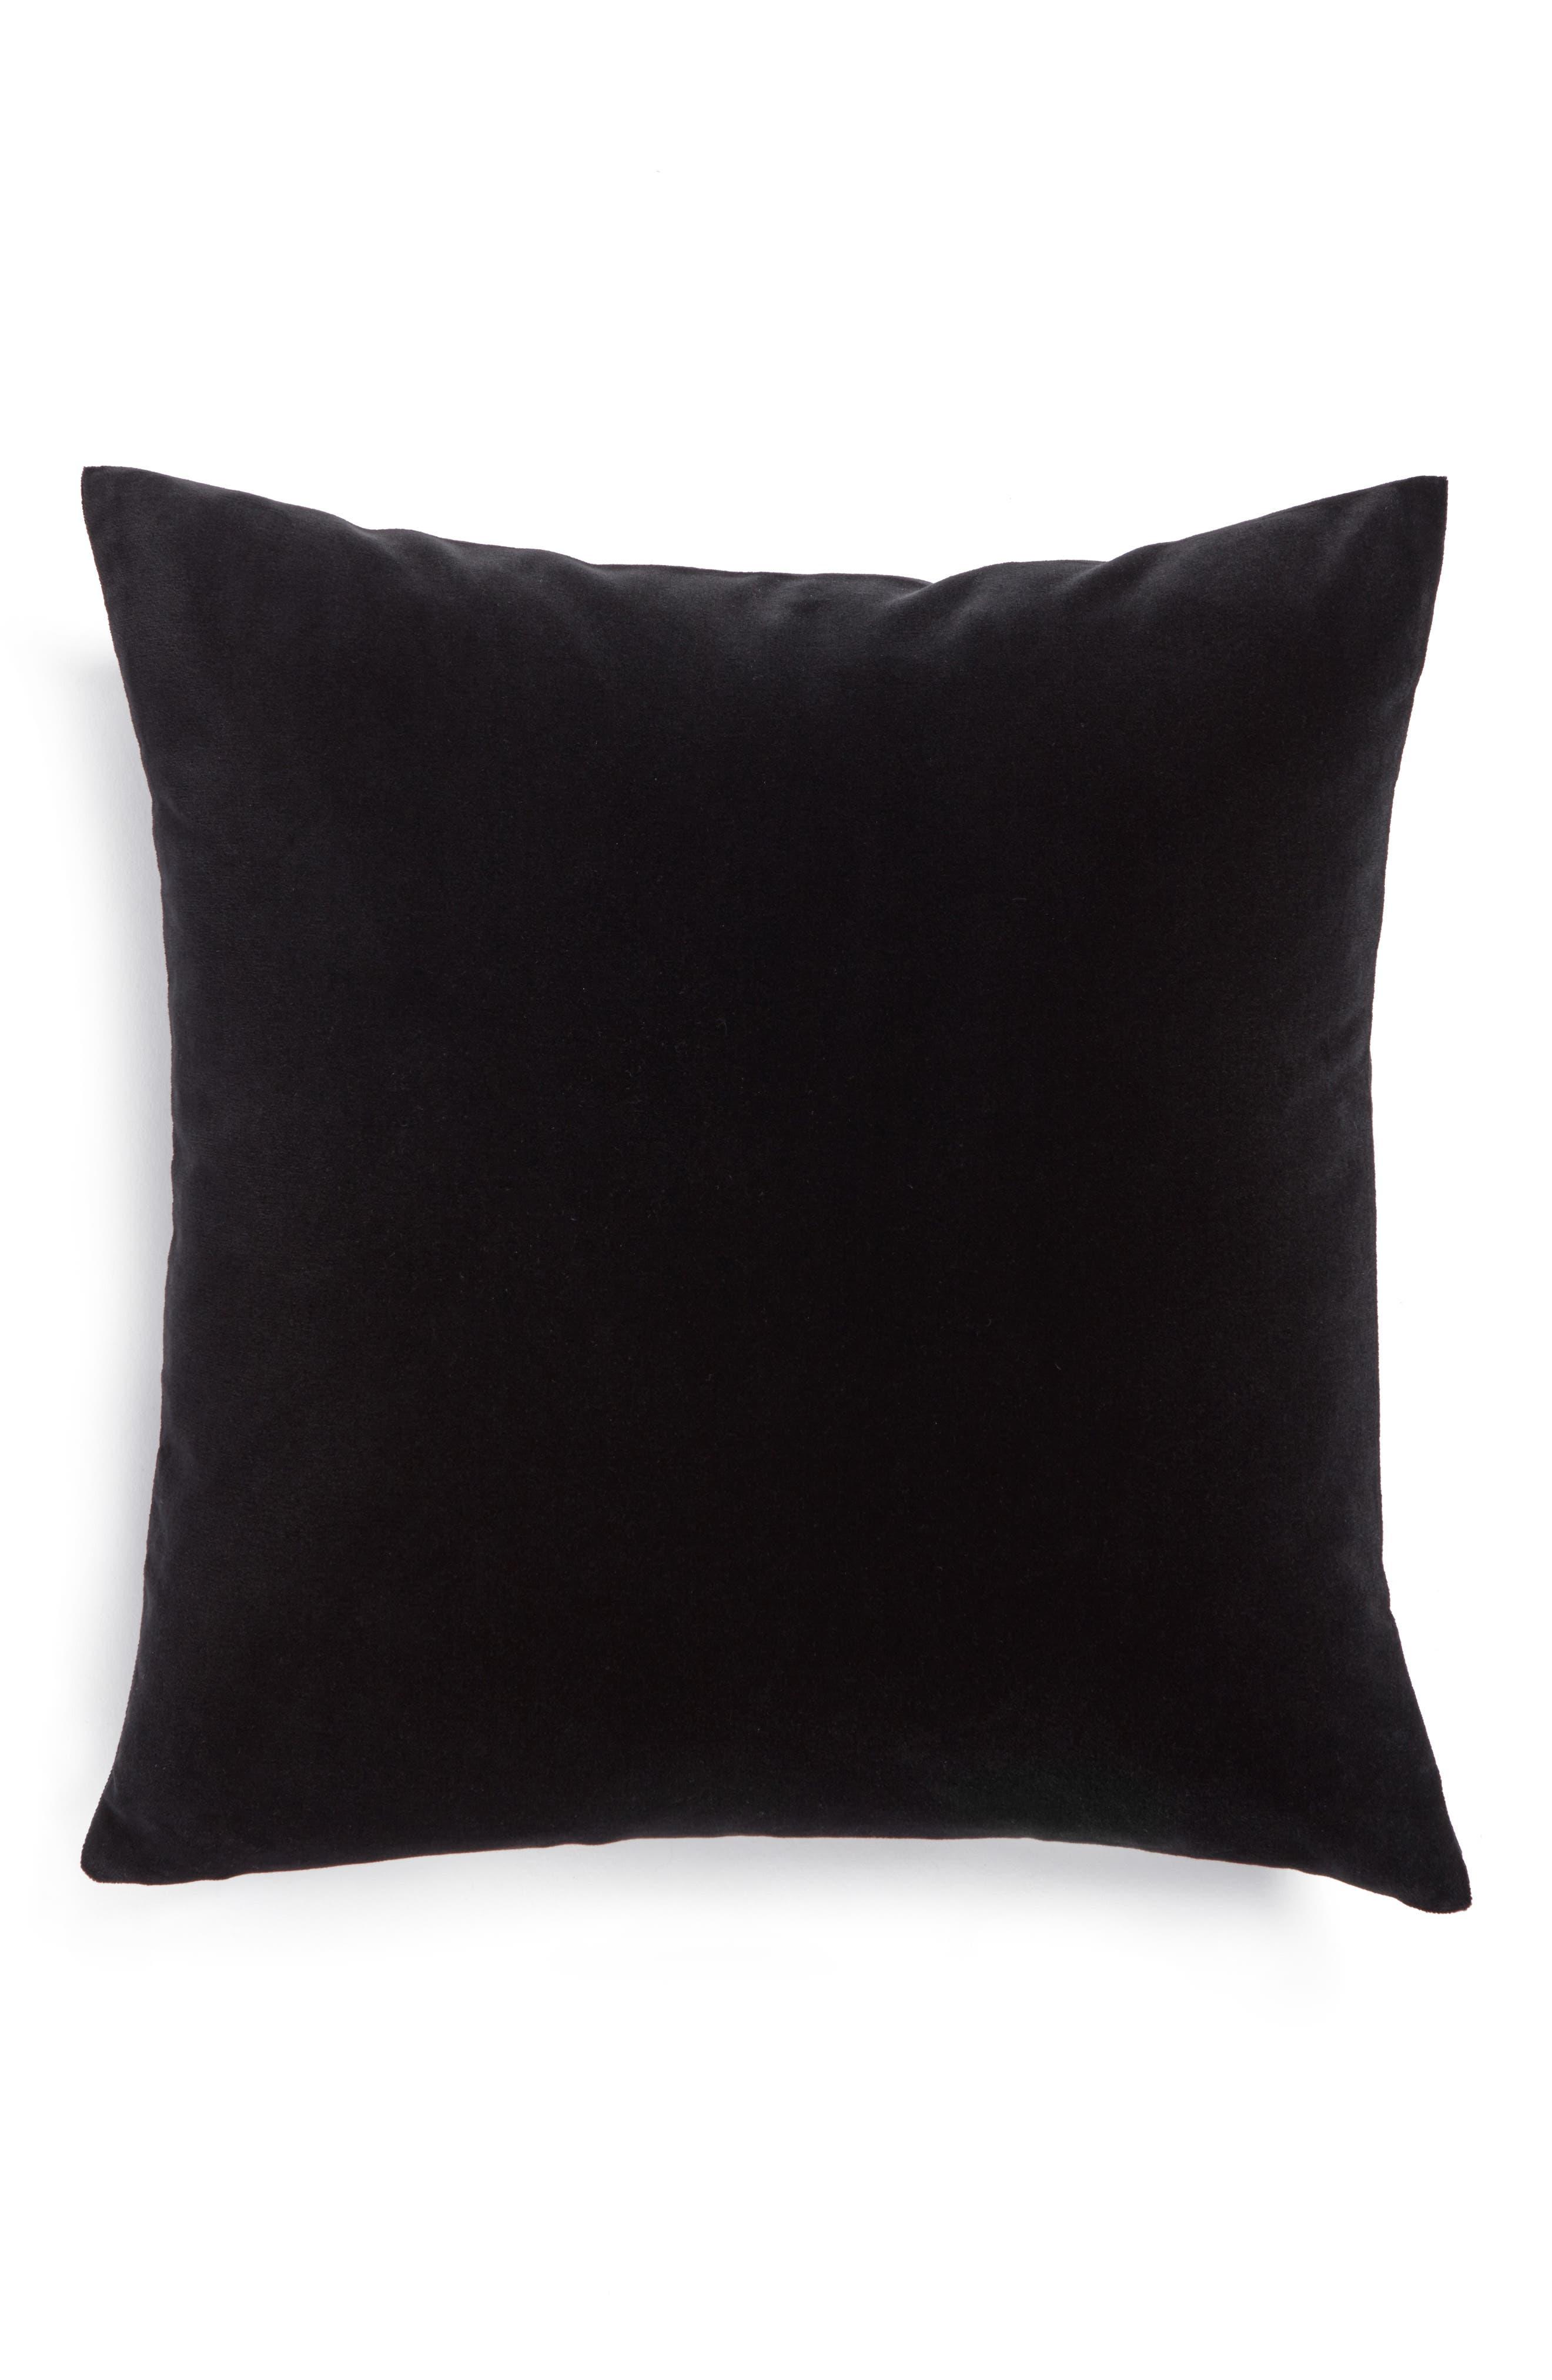 Lucerne Velvet Pillow,                             Main thumbnail 1, color,                             001